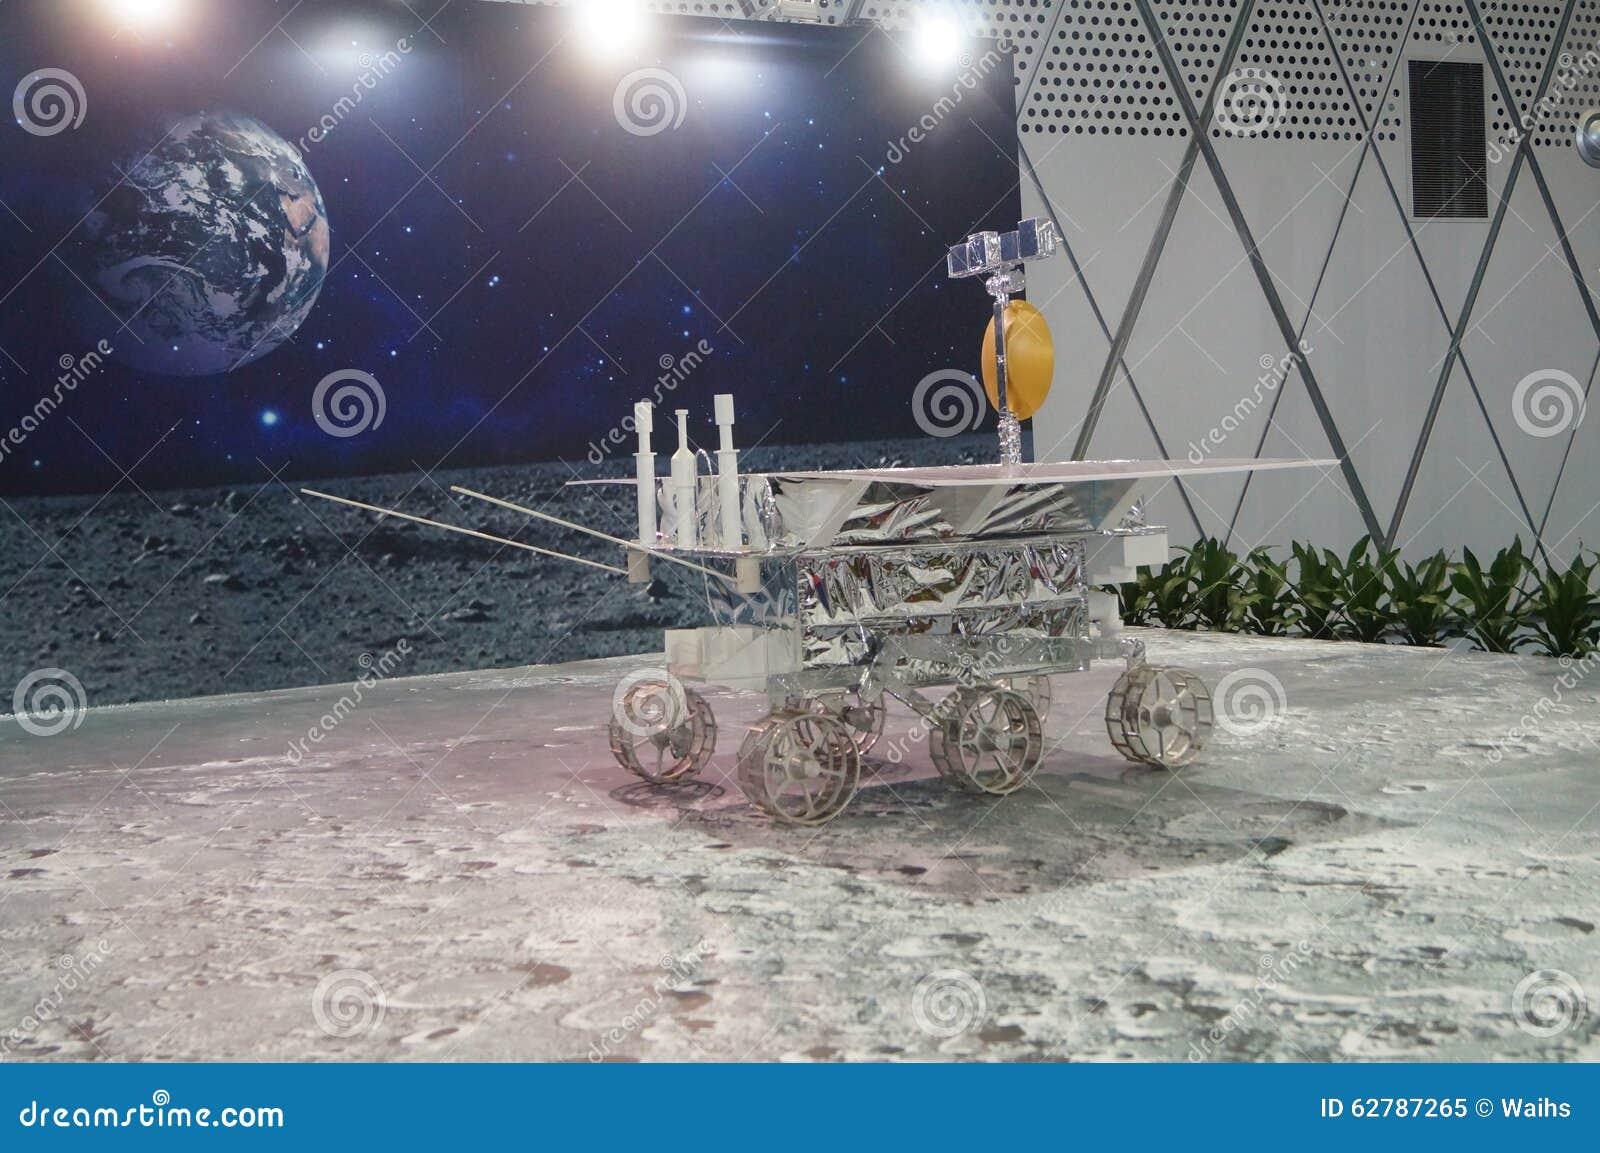 Shenzhen, China: Chinese Lunar Exploration Program science Awareness Week activities